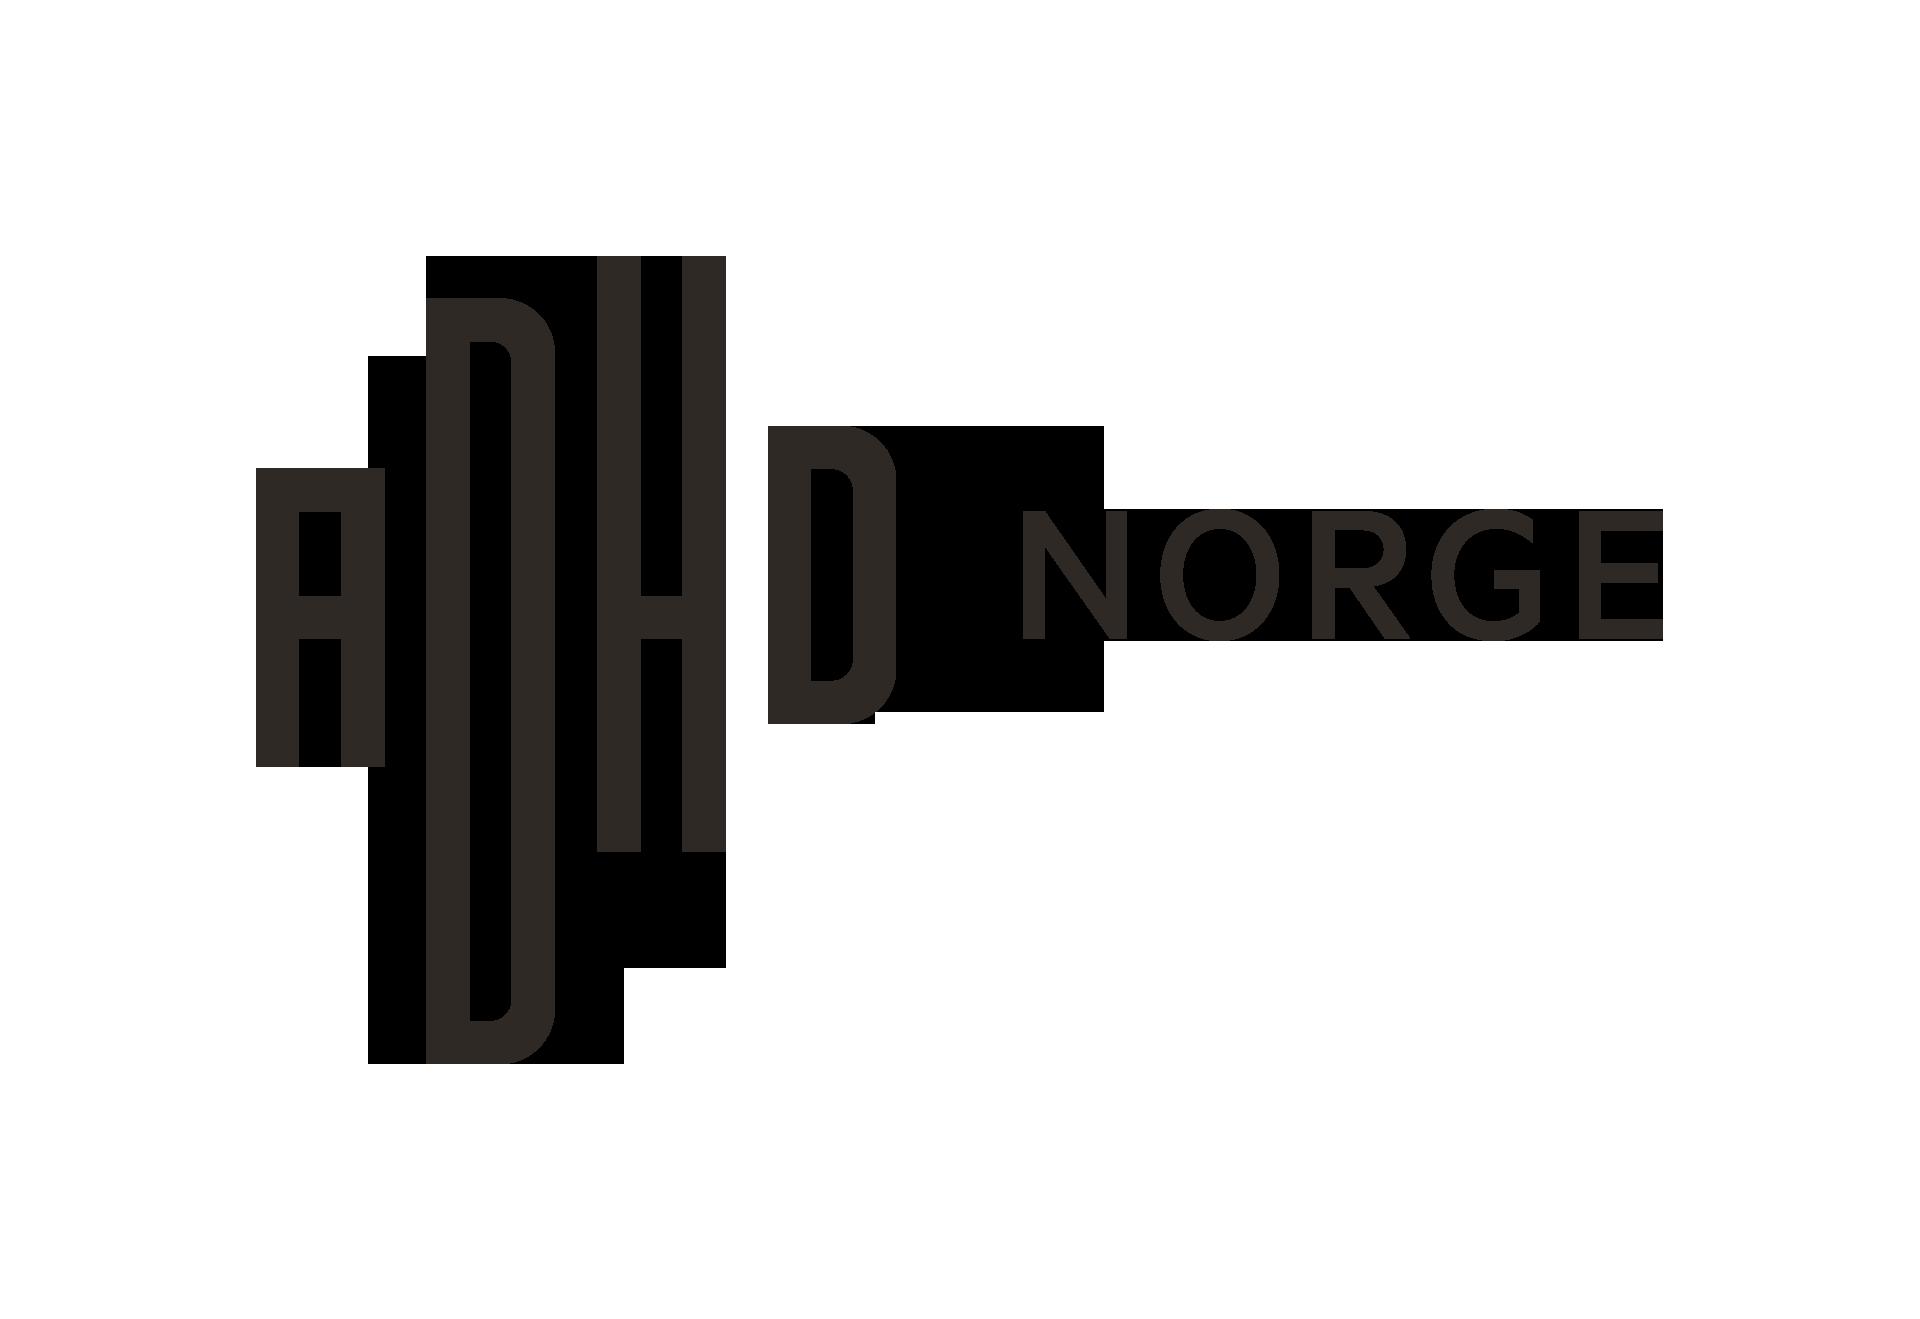 Logo ADHD Norge (bilde)